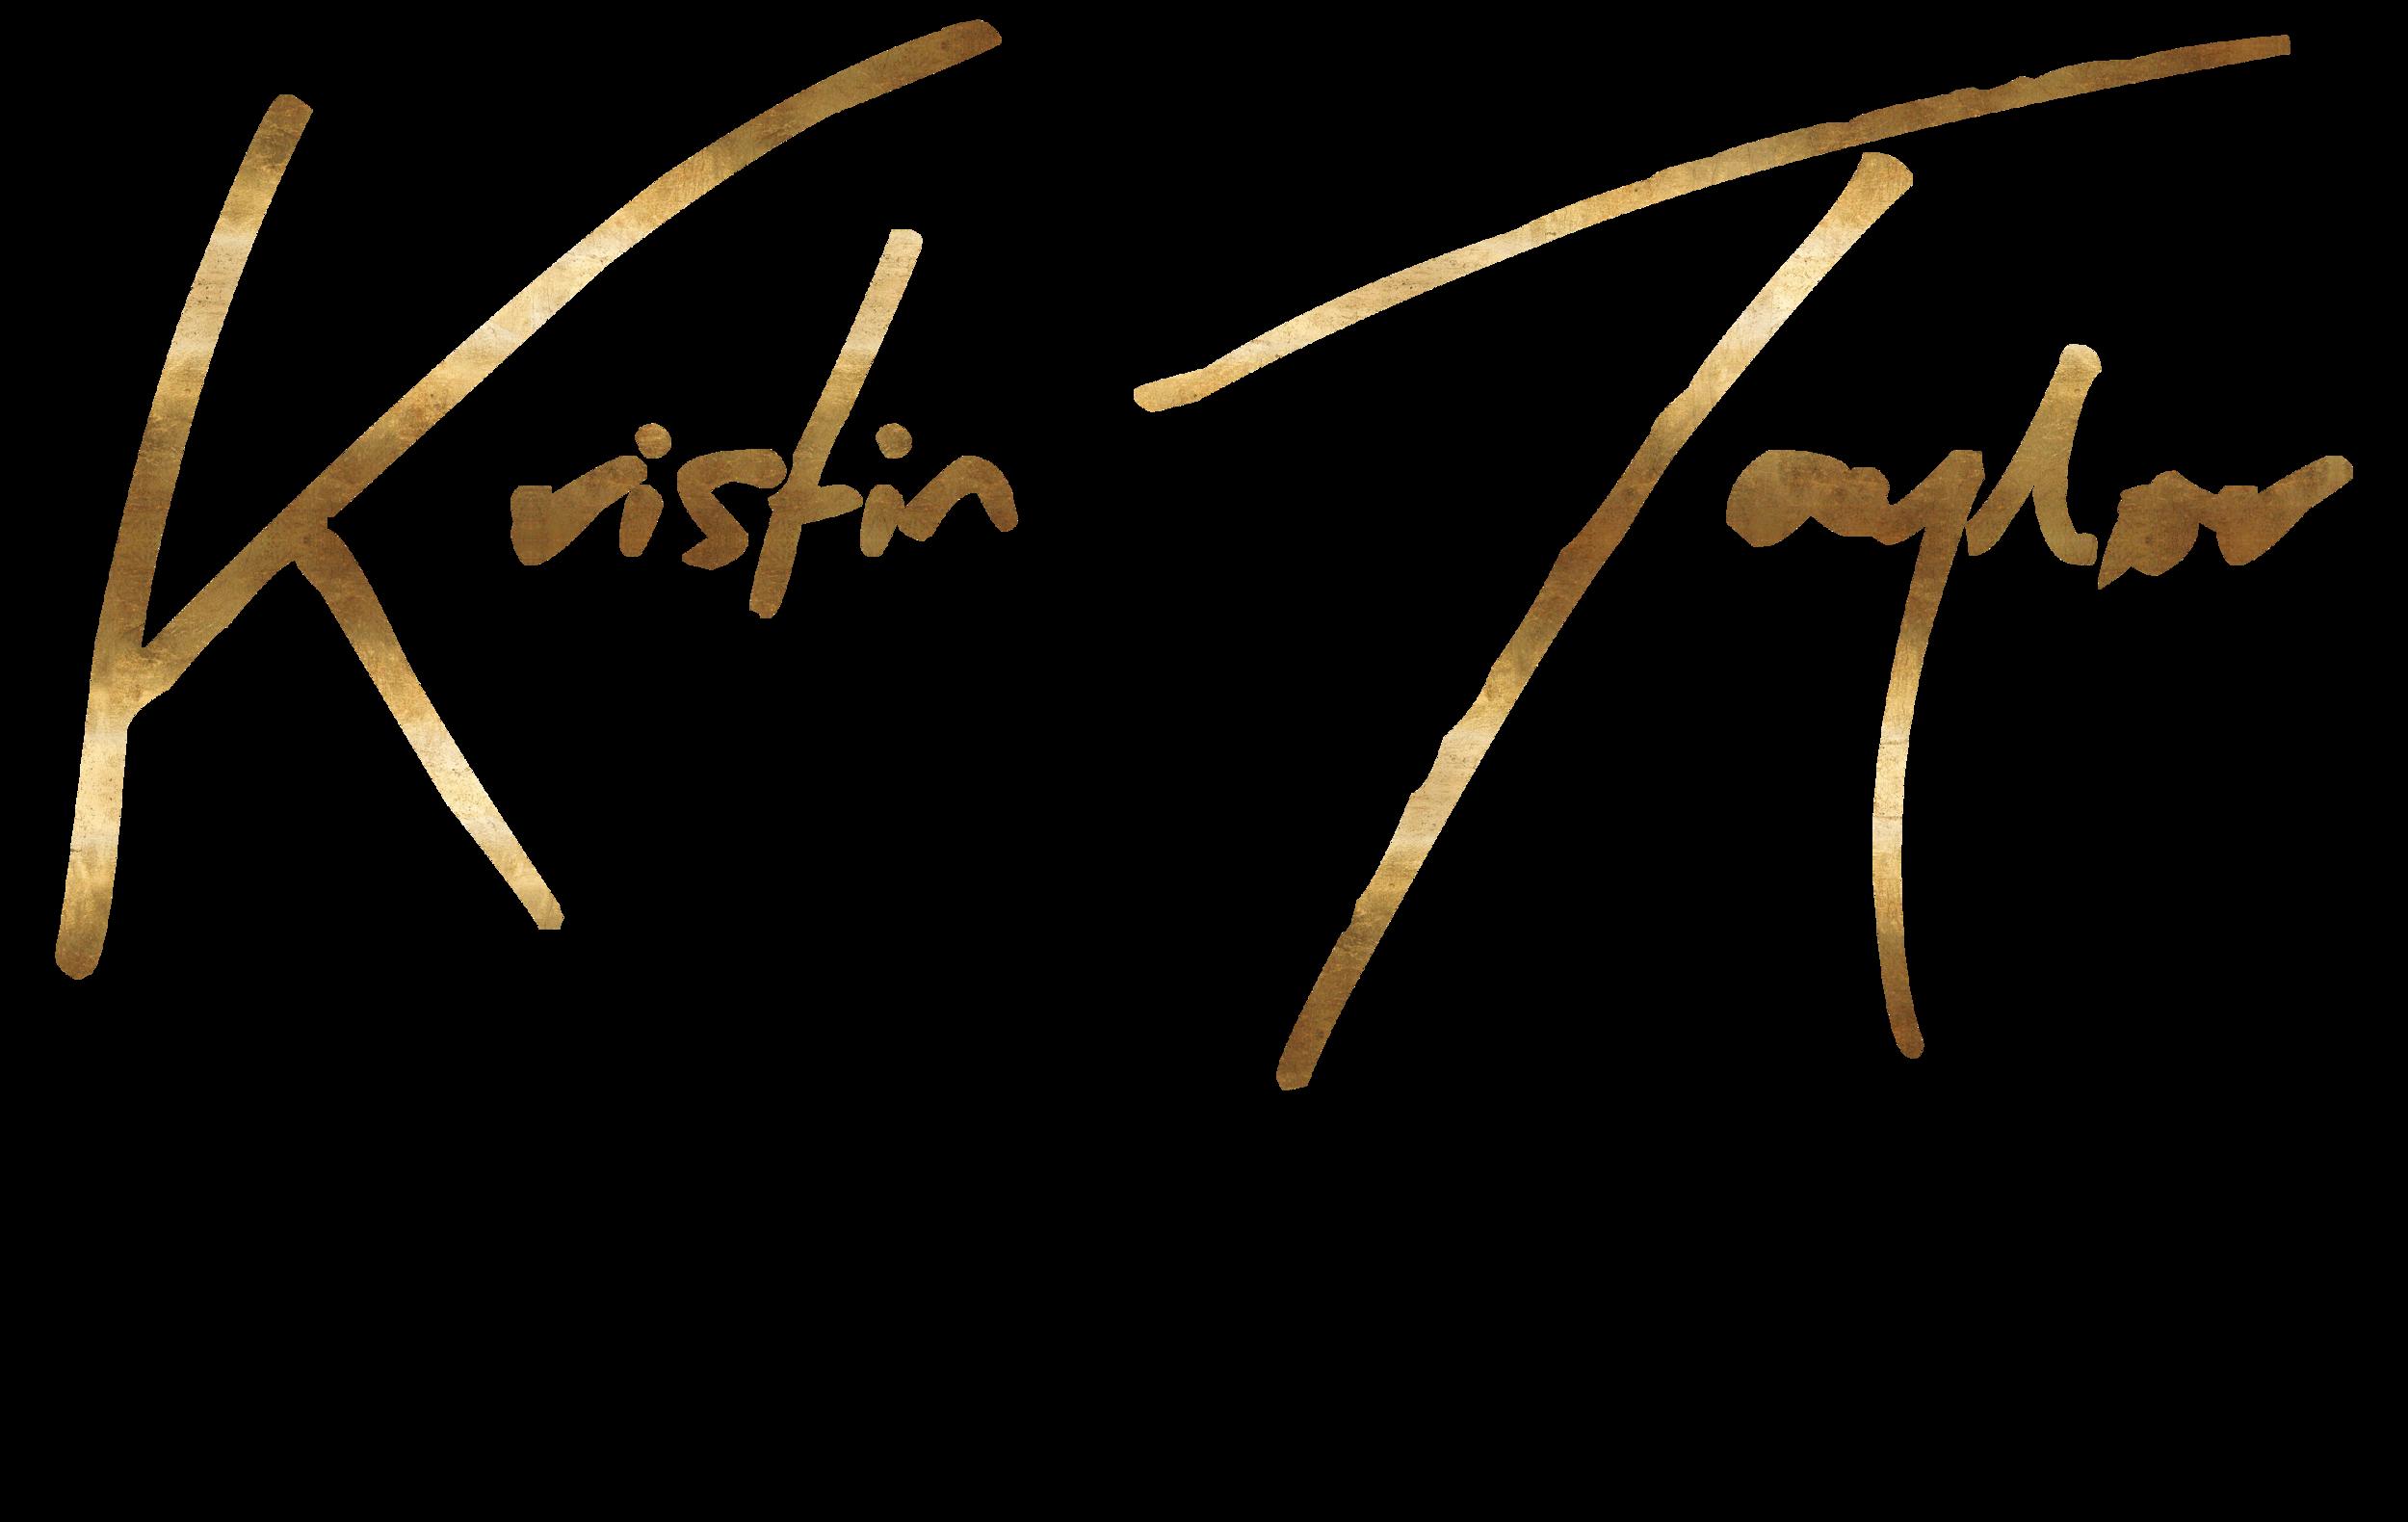 Kristin-Taylor-Submark.png